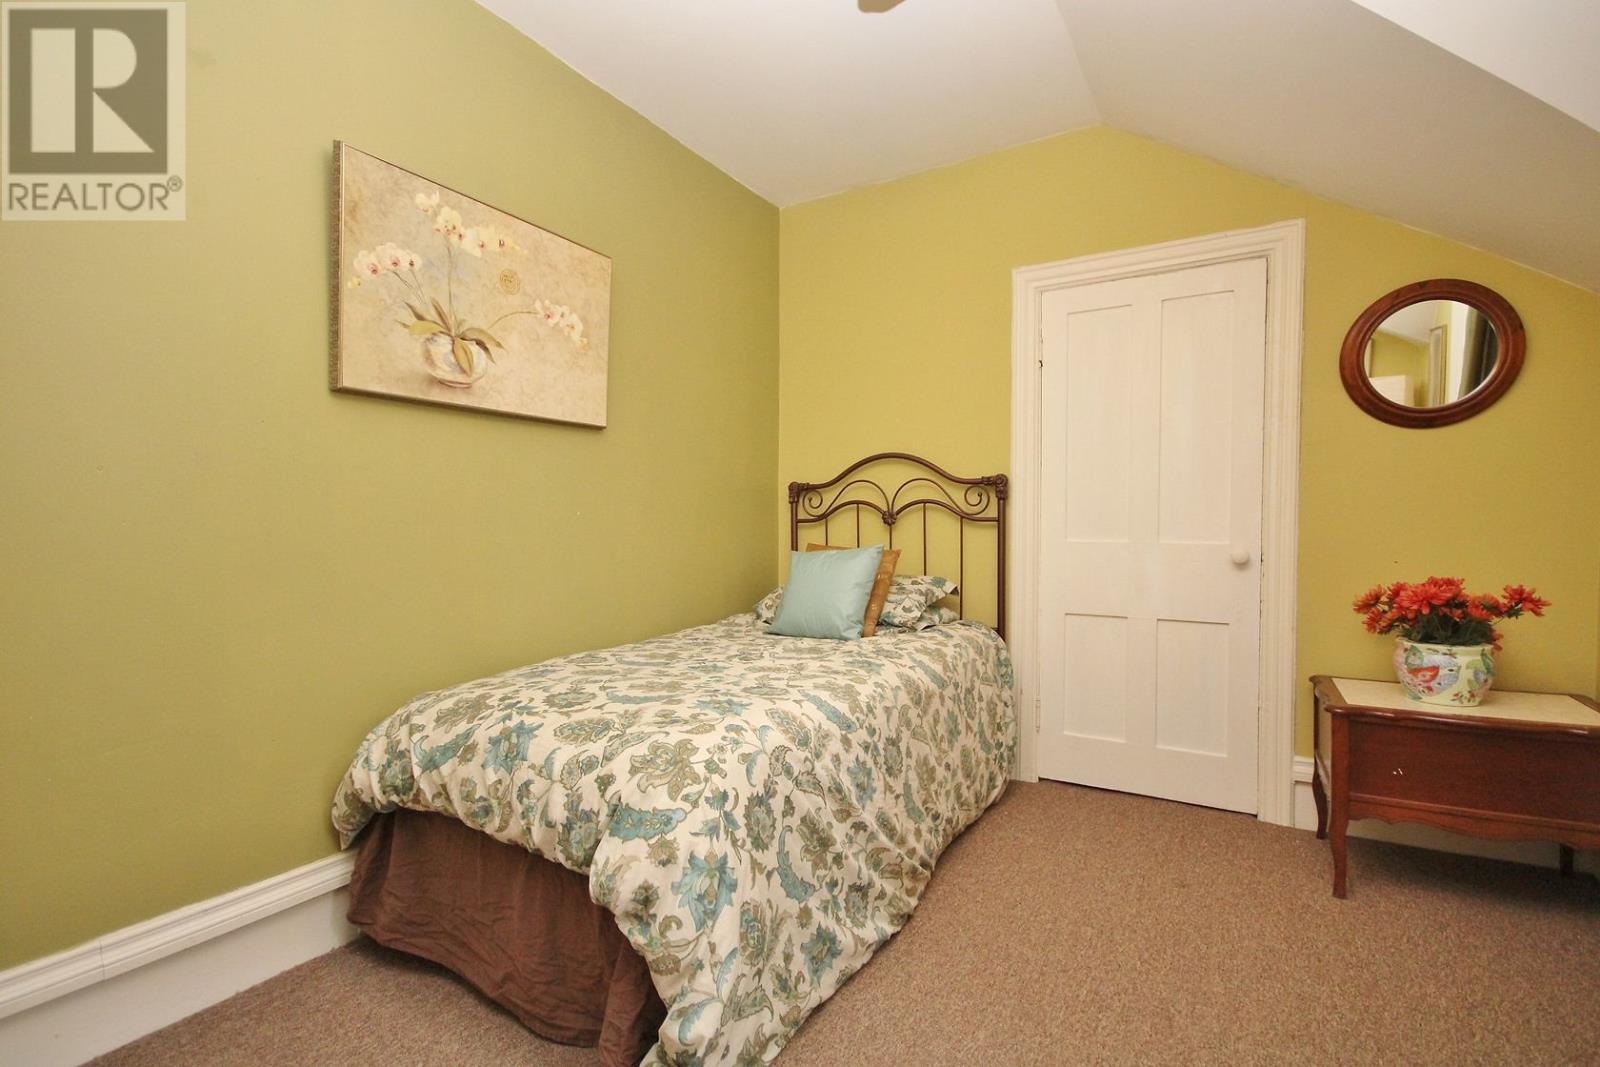 194 Centre St N, Greater Napanee, Ontario  K7R 1N8 - Photo 19 - K21002331